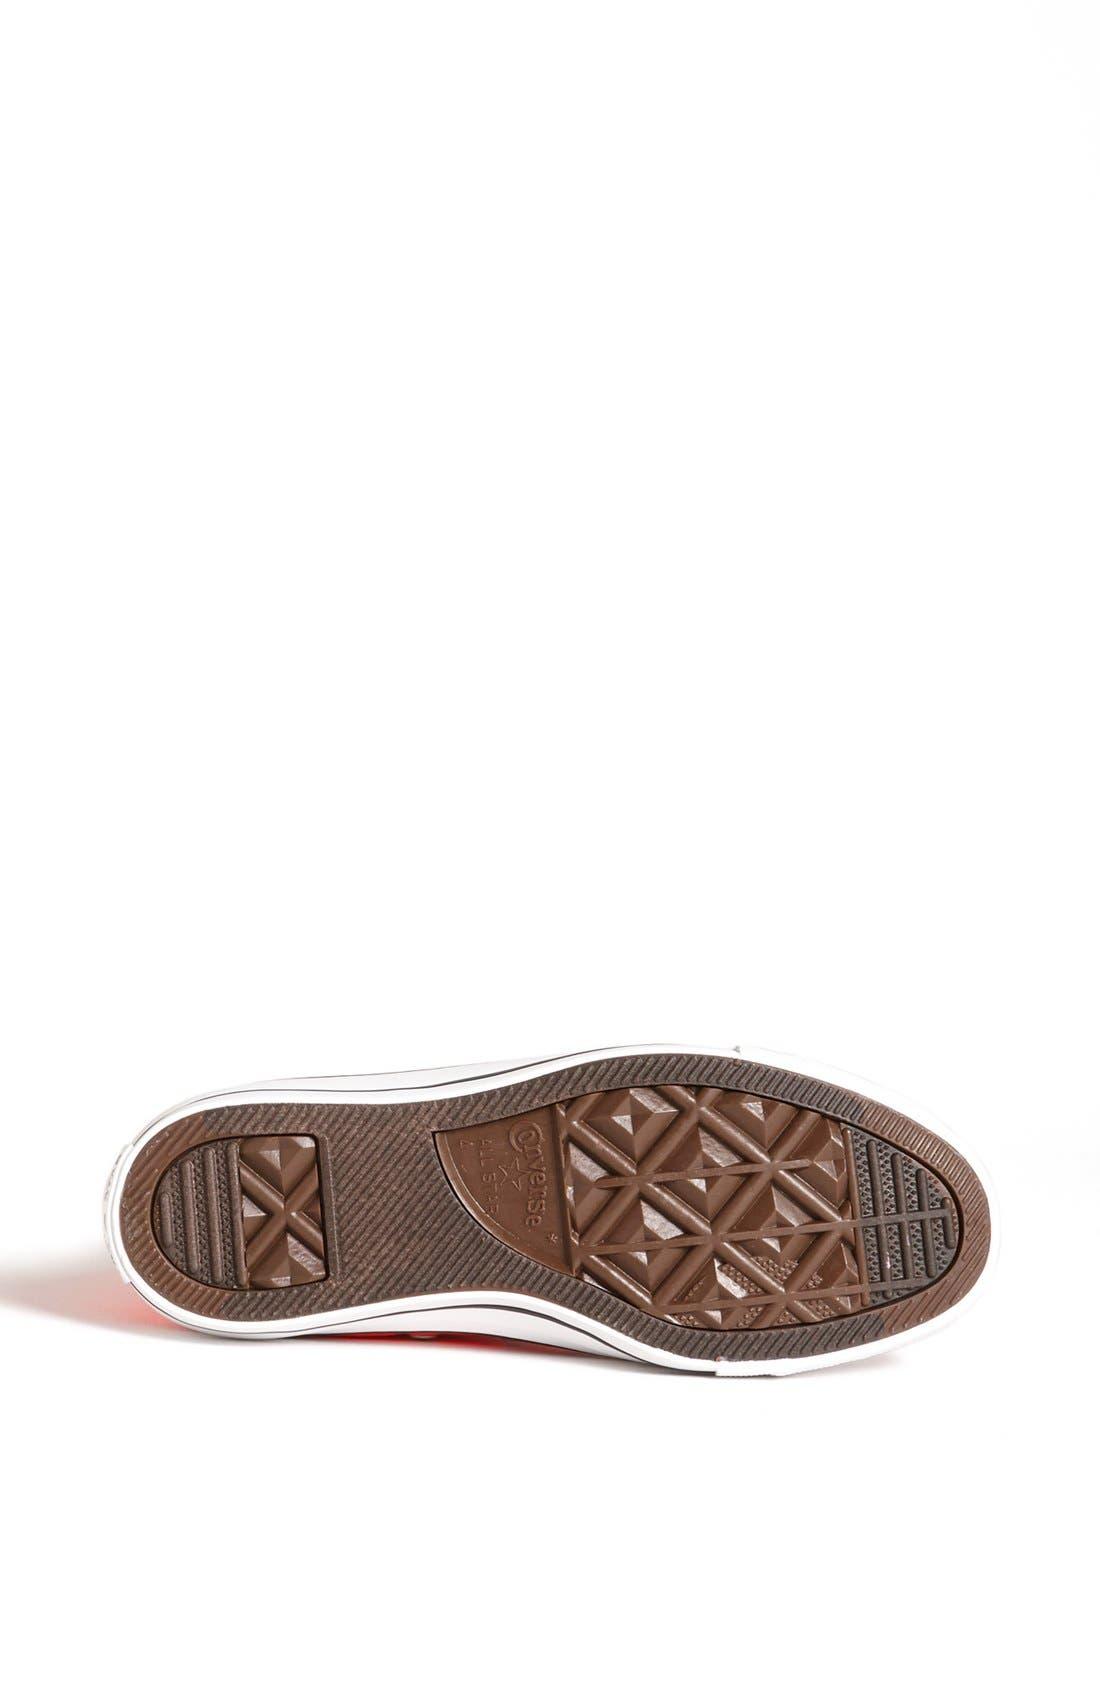 Alternate Image 4  - Converse Chuck Taylor® All Star® 'Fiery Coral' High Top Sneaker (Women)